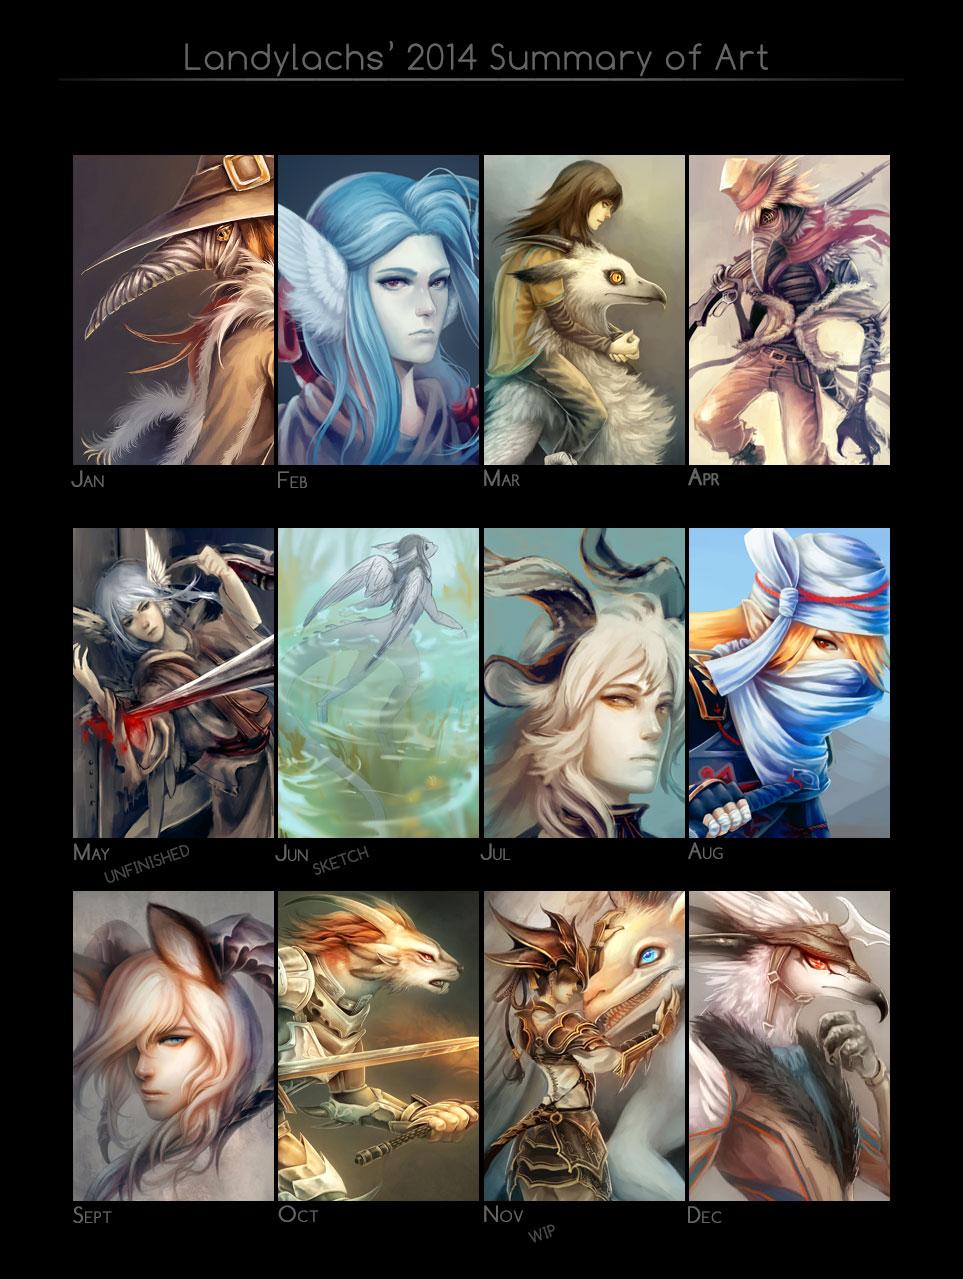 2014-landylachs-summary-of-art